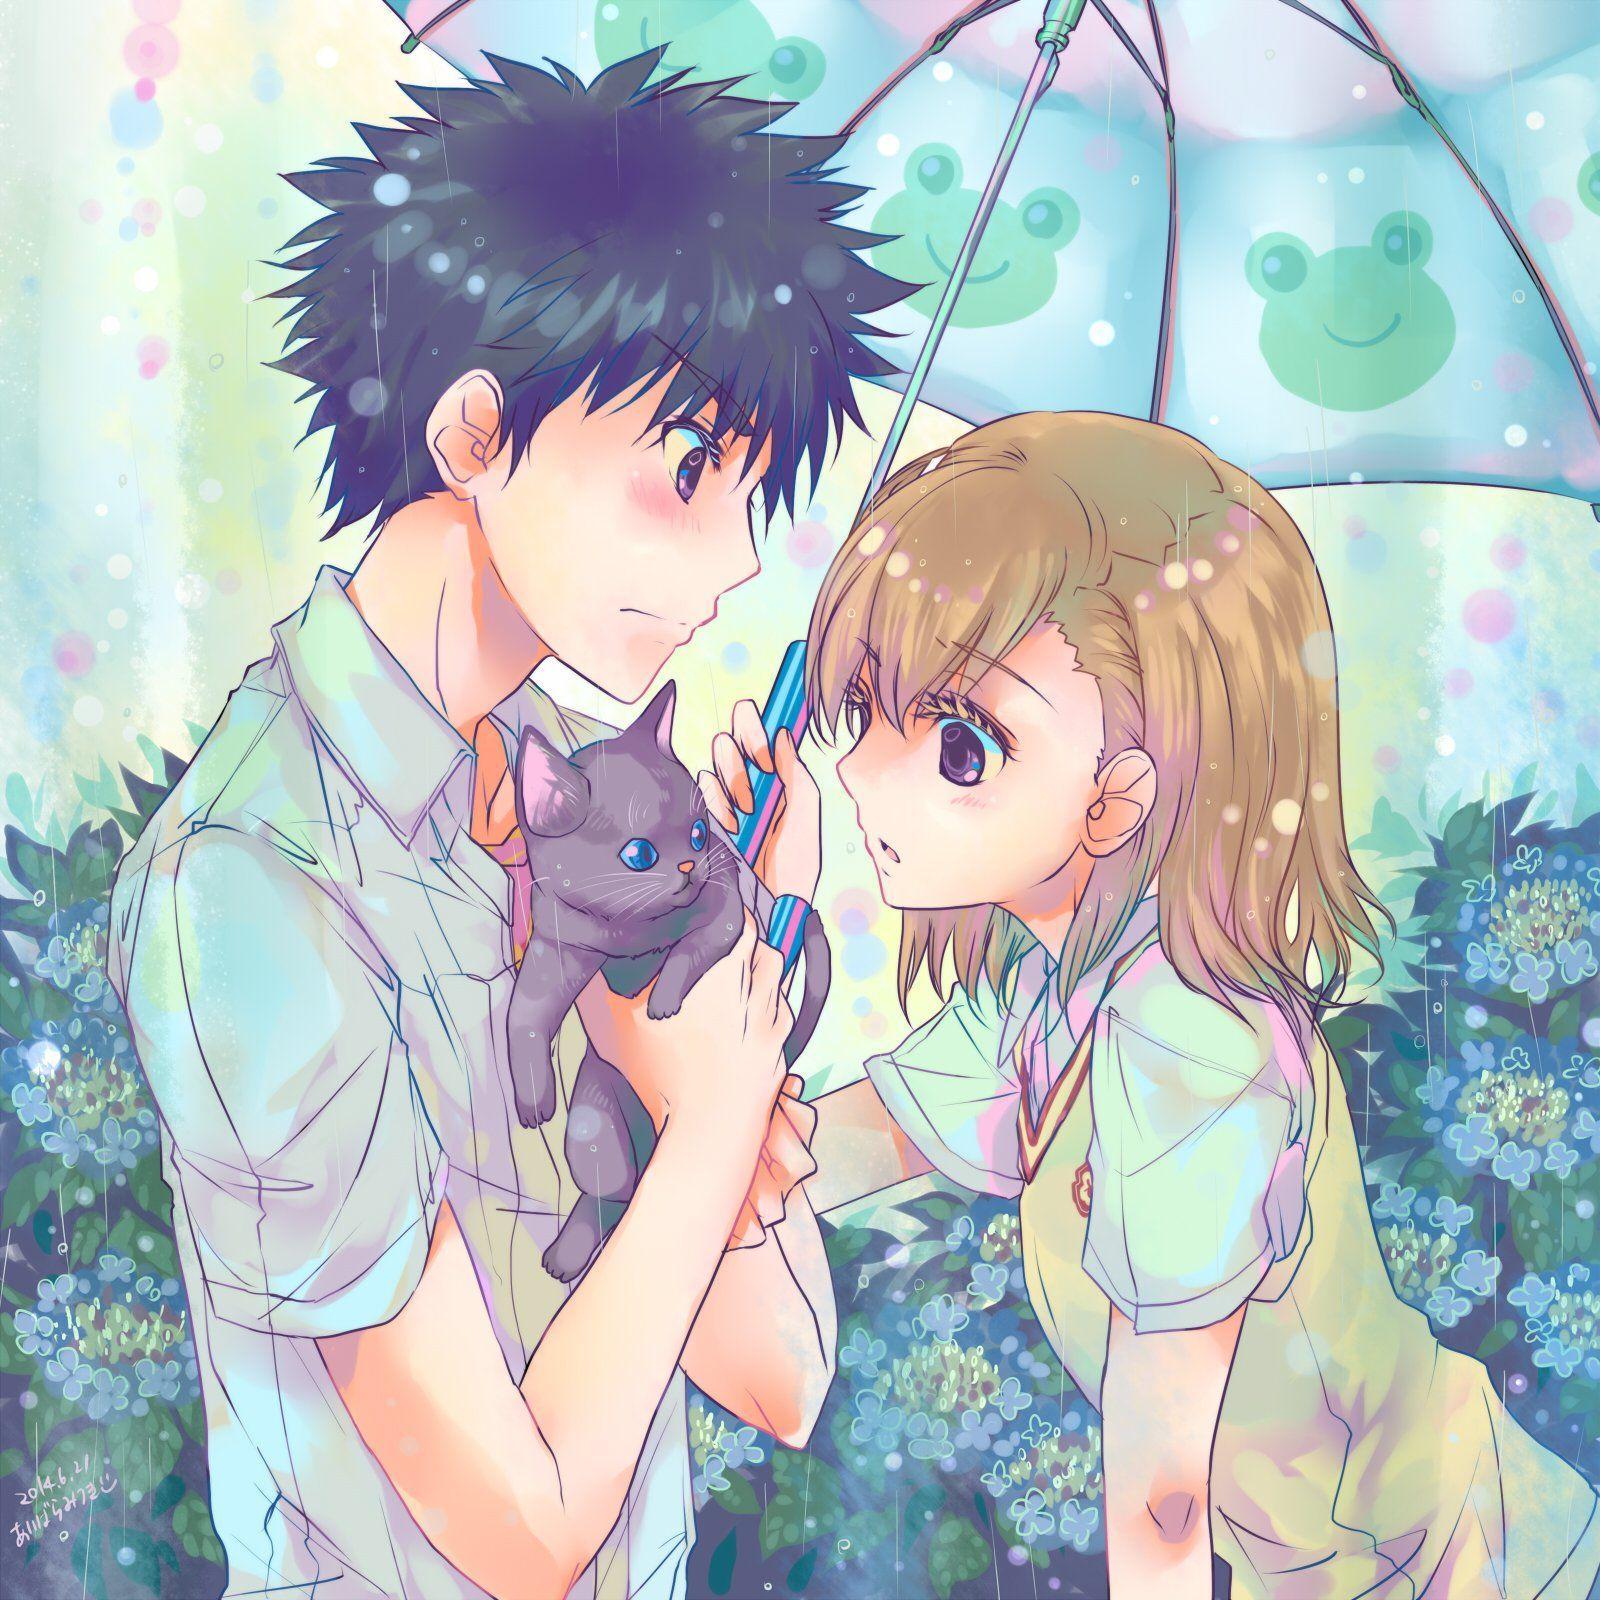 Download 88 Wallpaper Anime Couple Hd Terpisah Hd Gratid Wallpaper Keren